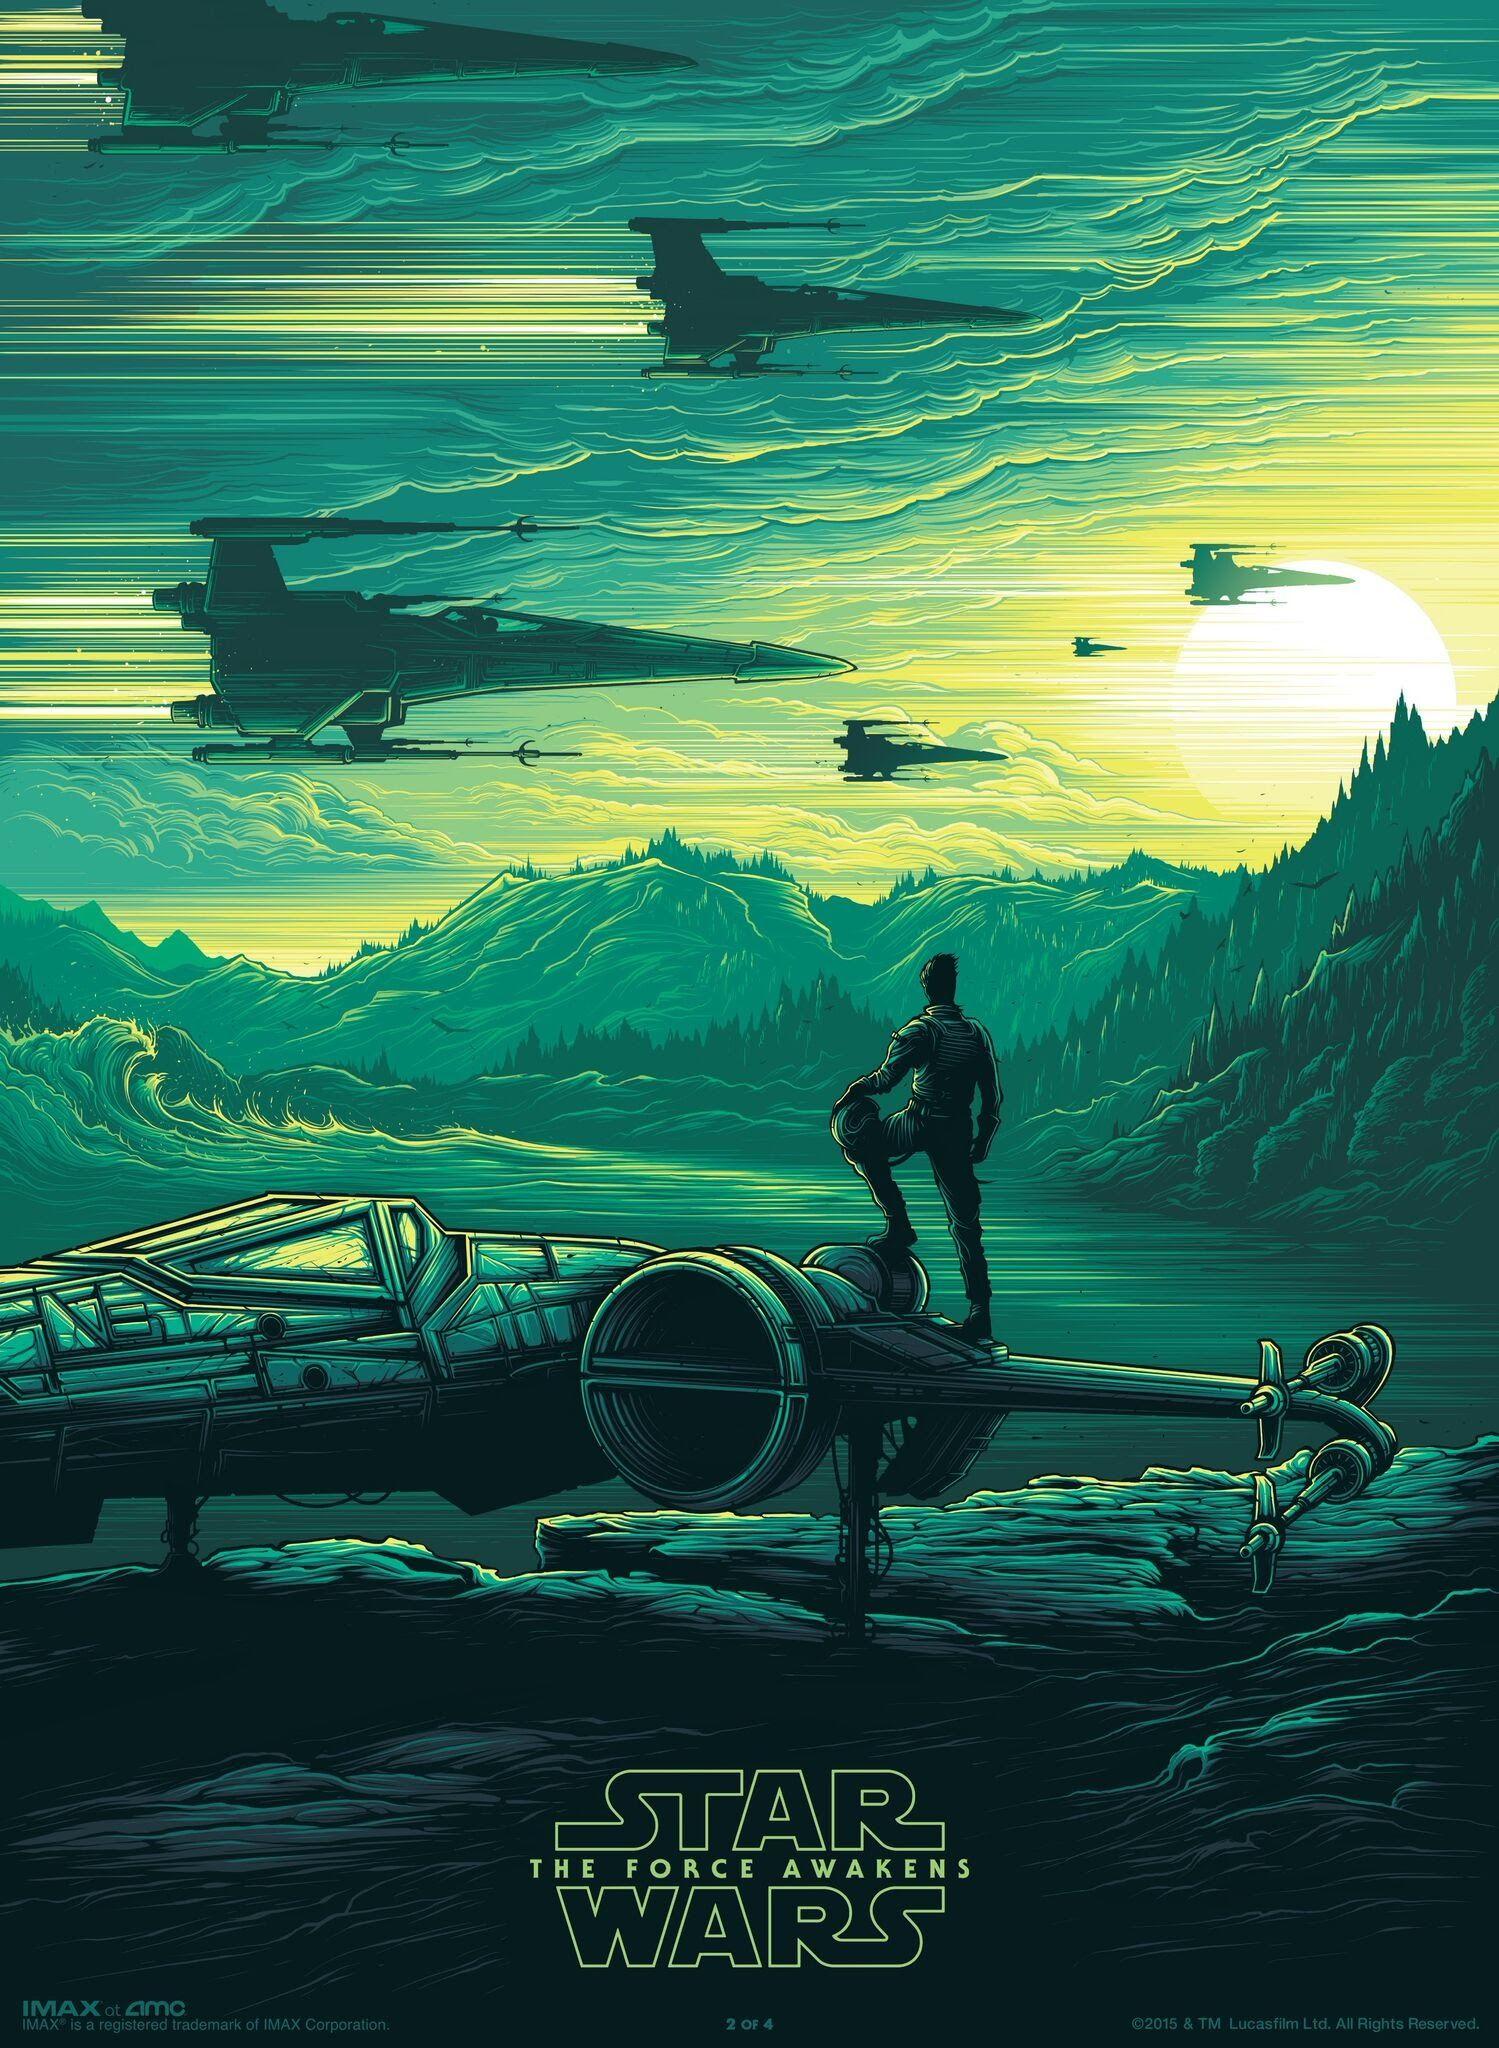 Starwars Mobile Wallpapers Star Wars Imax Poster 1499x2048 Wallpaper Teahub Io